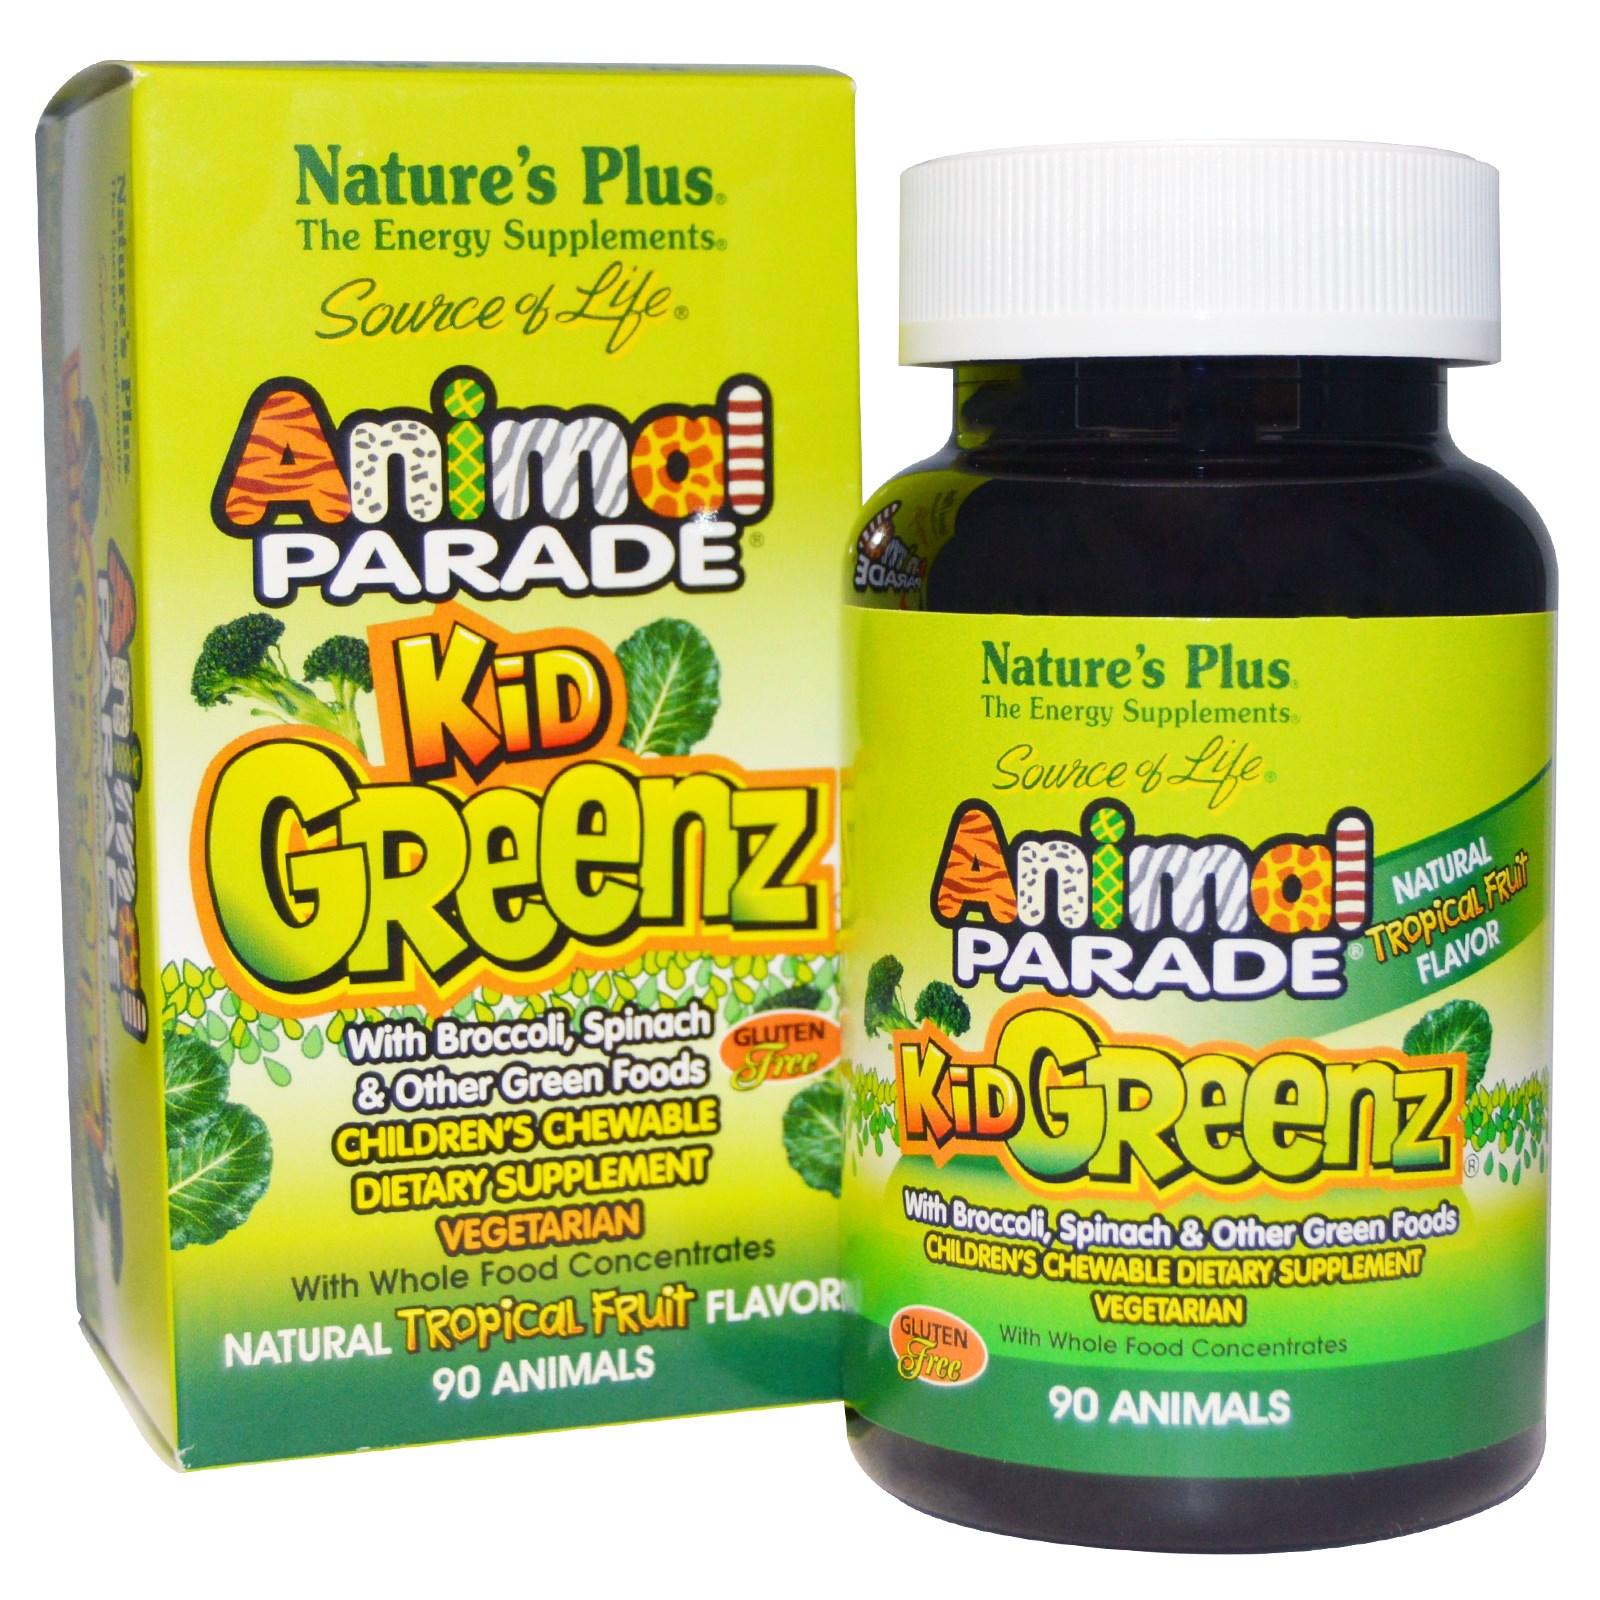 Source of life animal parade